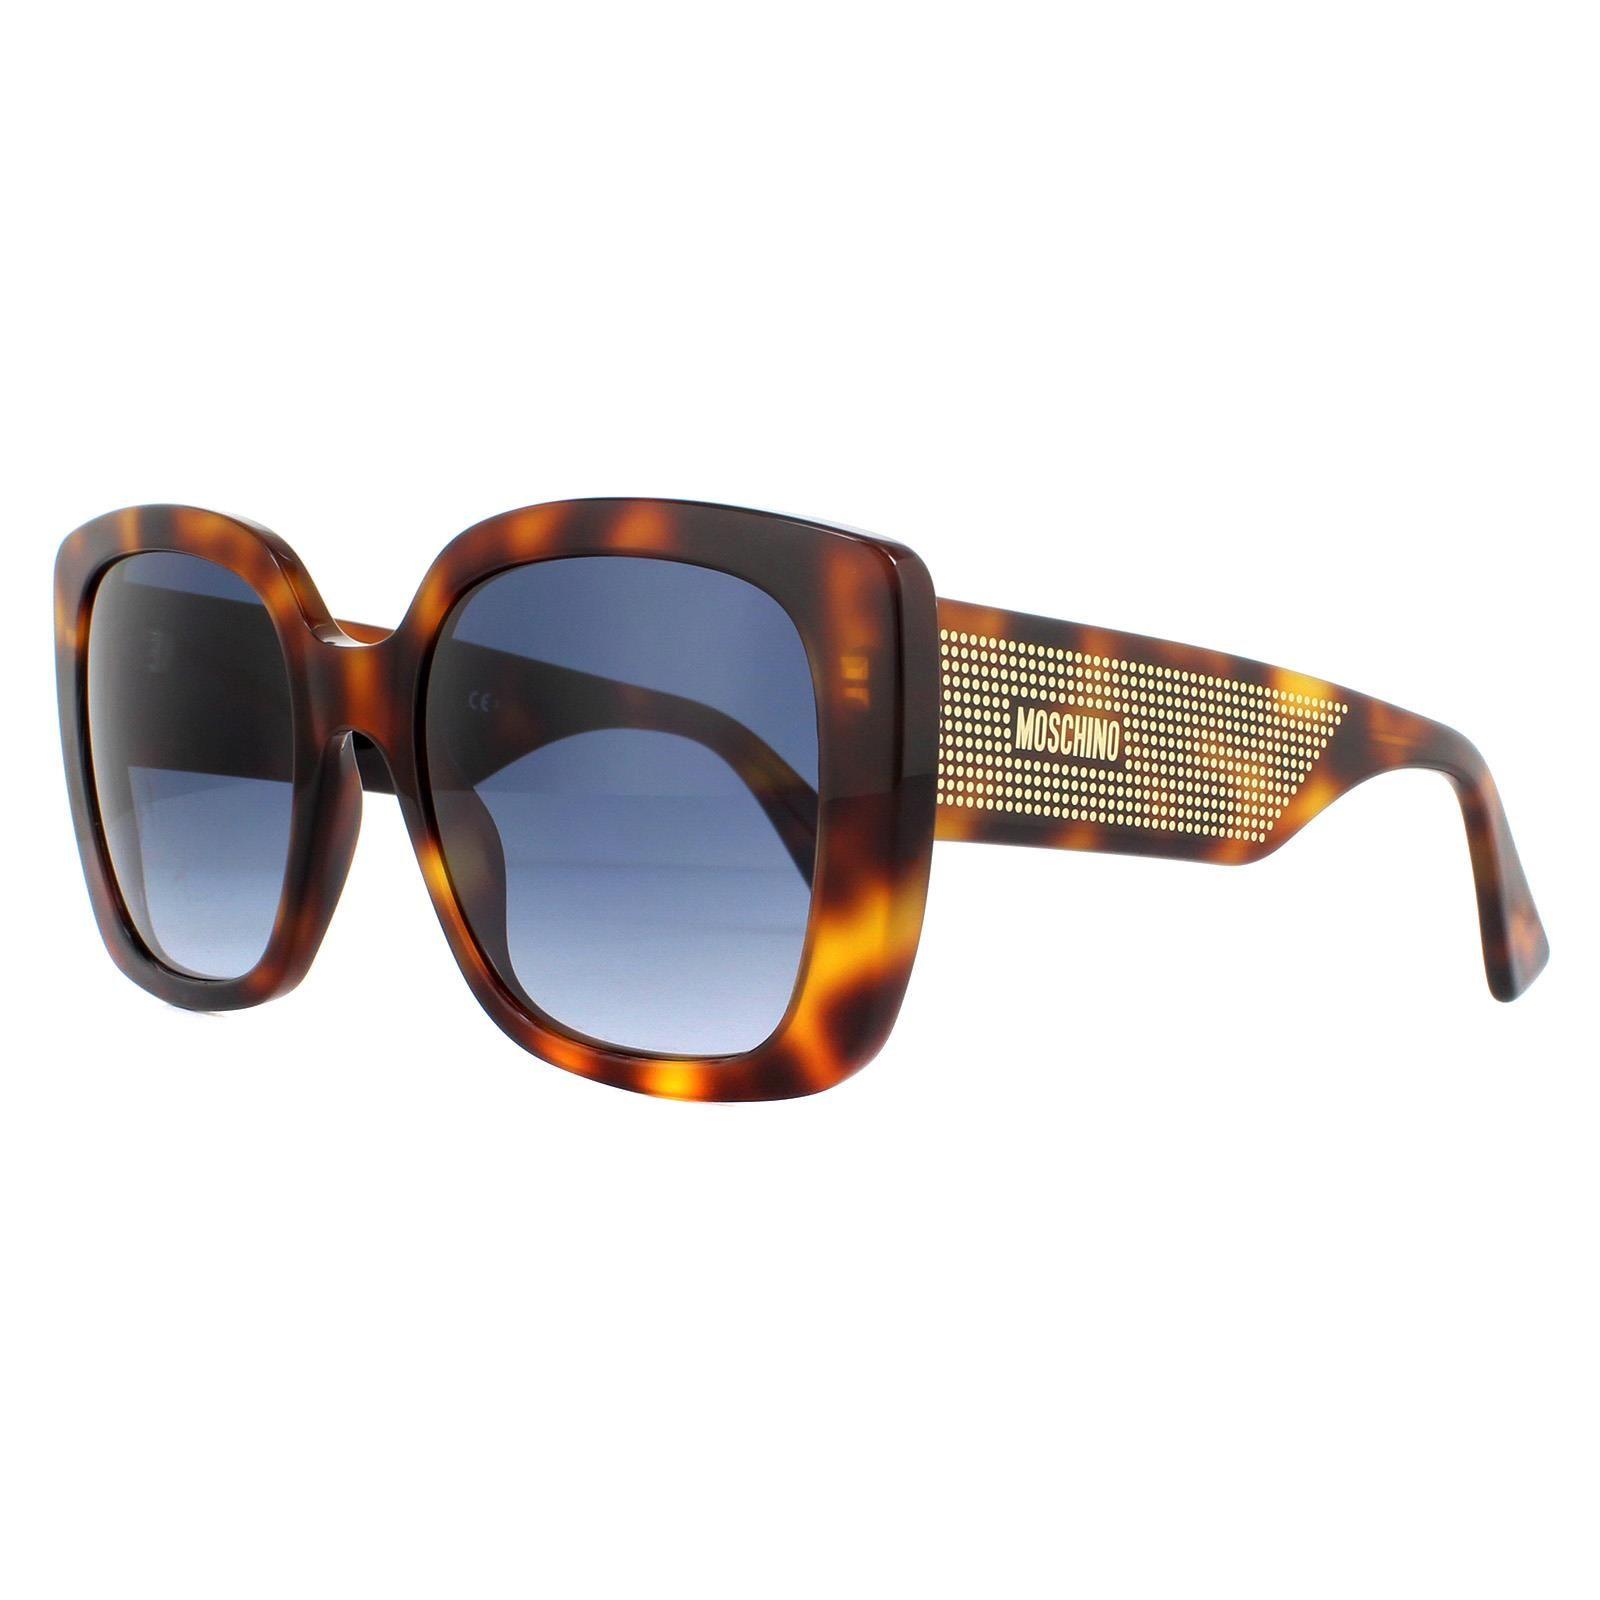 Moschino Sunglasses MOS016/S 086 08 Dark Havana Dark Blue Gradient